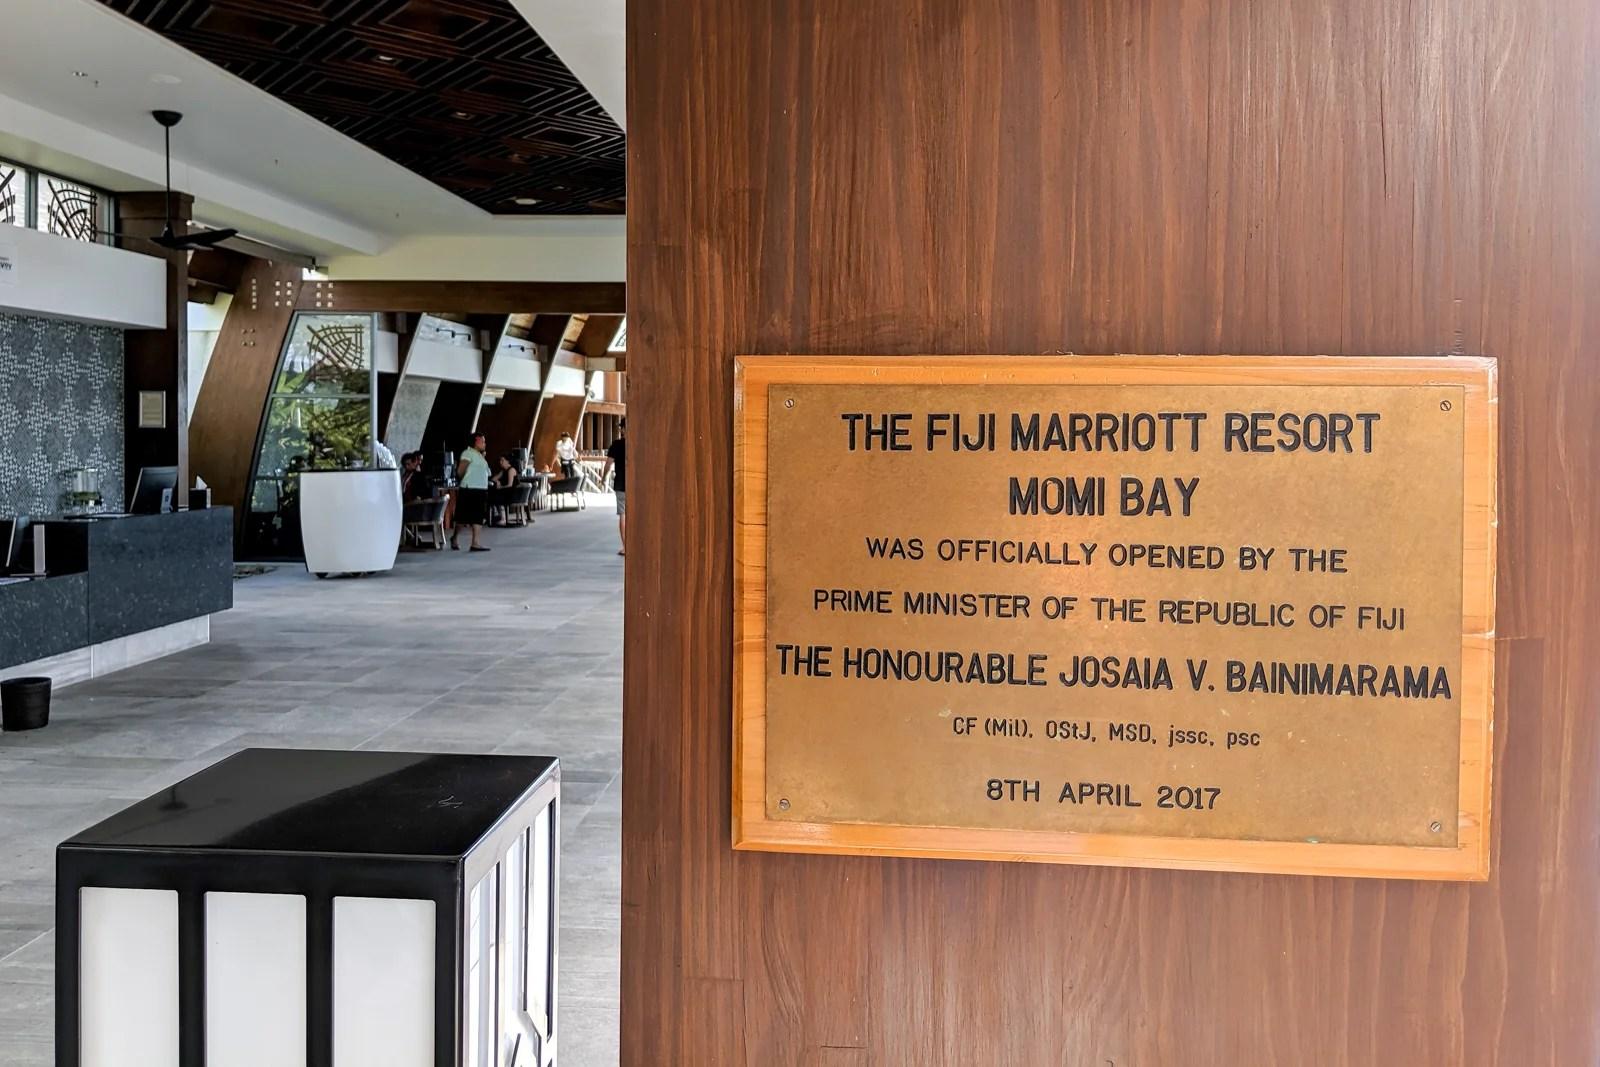 A Review of the Fiji Marriott Resort Momi Bay